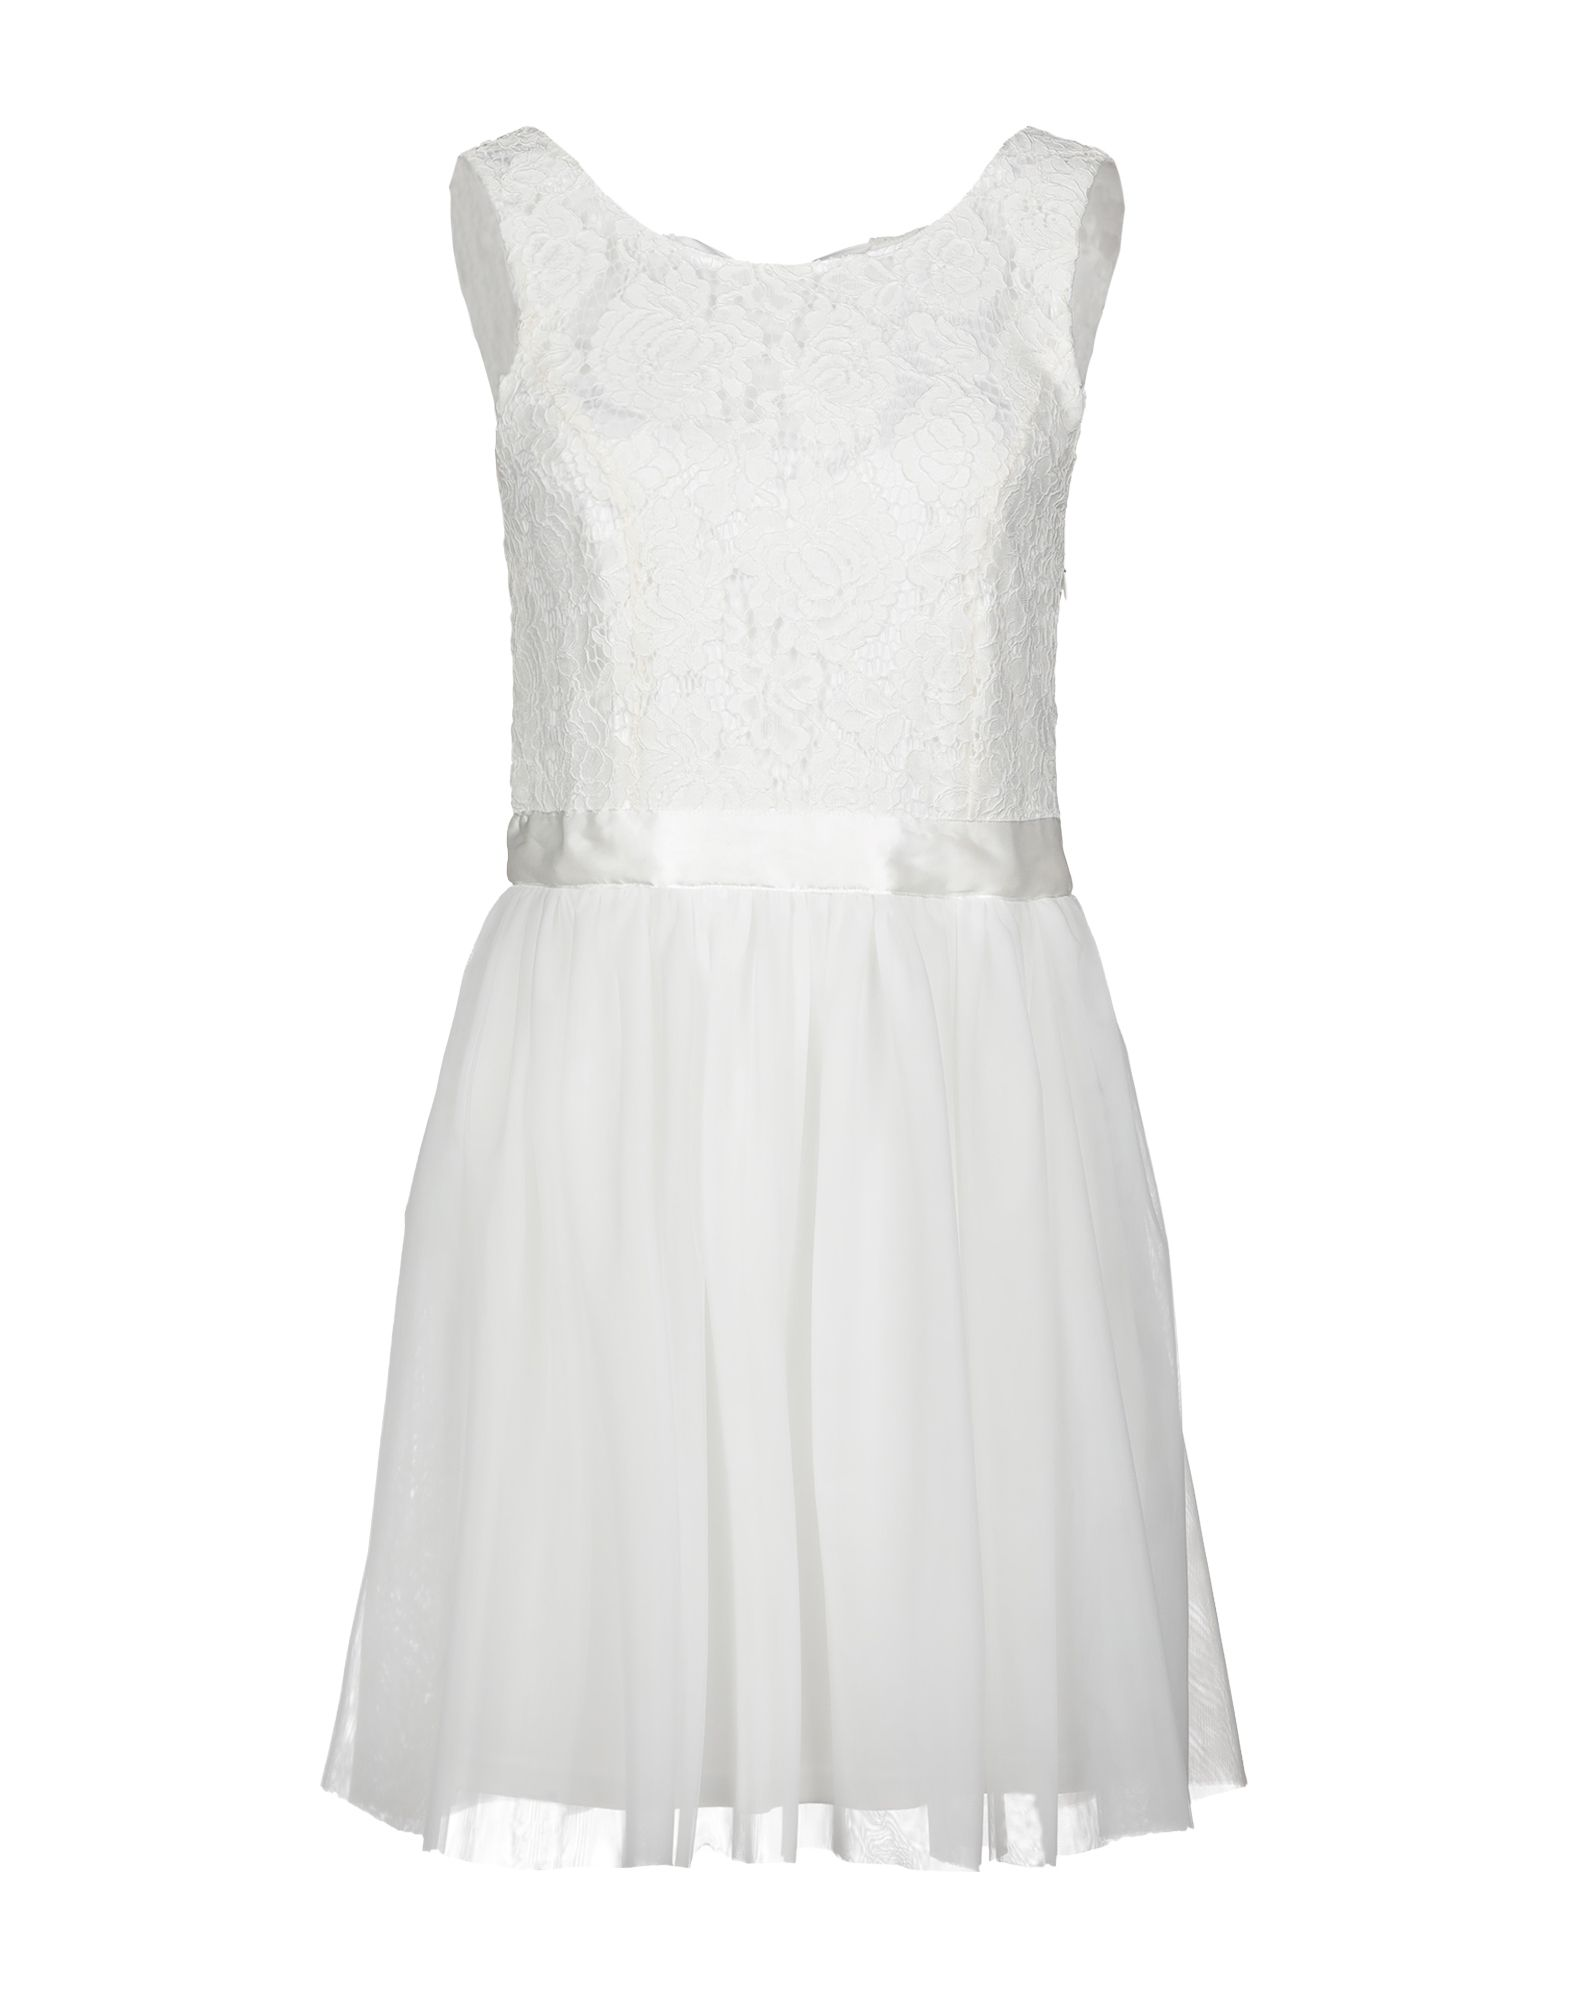 23d940dfe2f3 Γυναικεία Φορέματα με Δαντέλα Online - Φθηνότερα Προϊόντα - Σελίδα ...